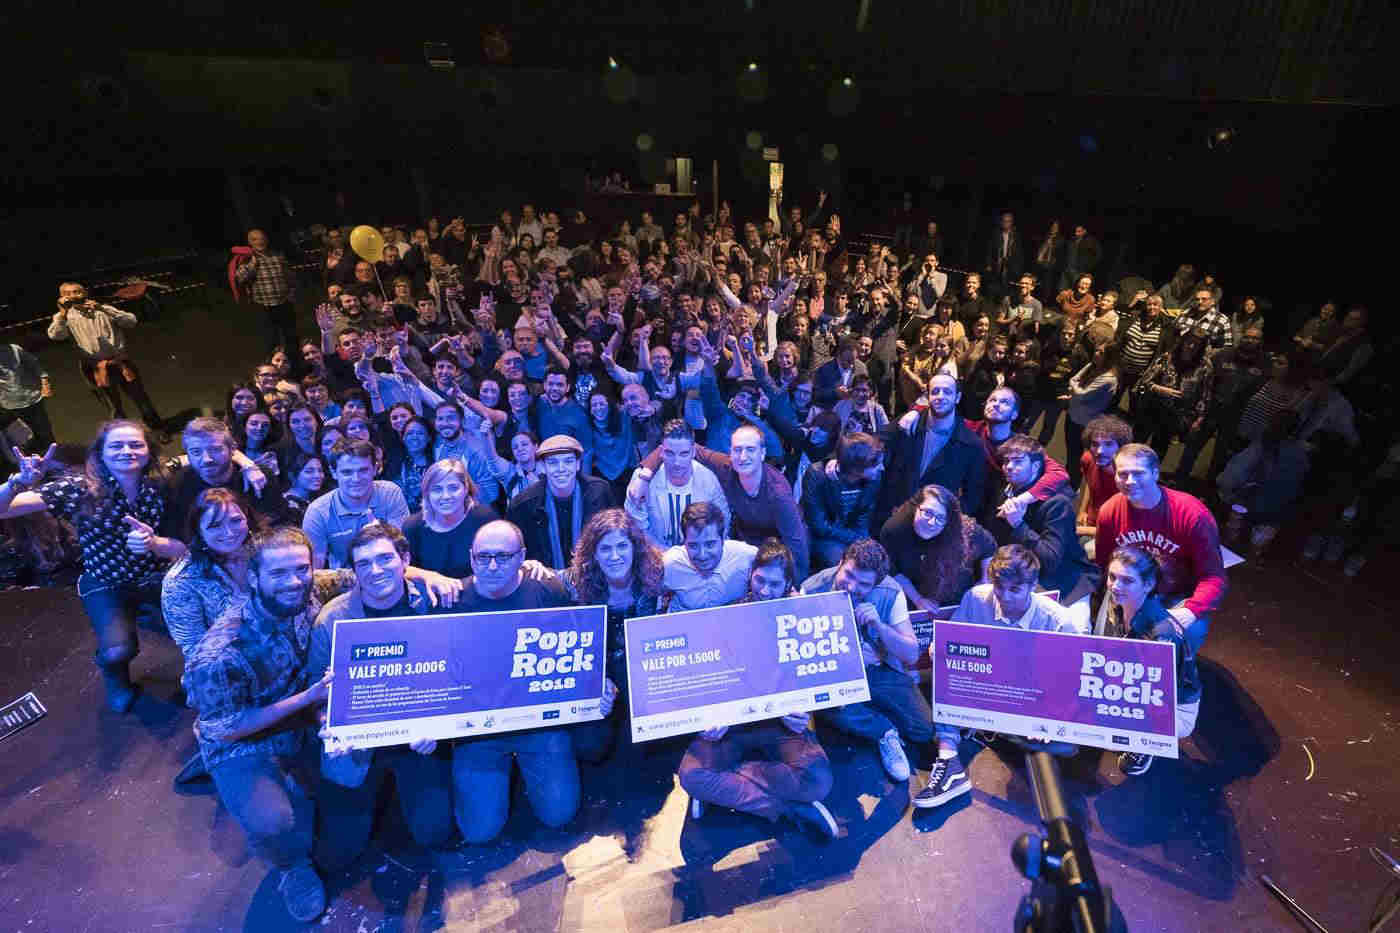 Banda ganadora del Popyrock 2018